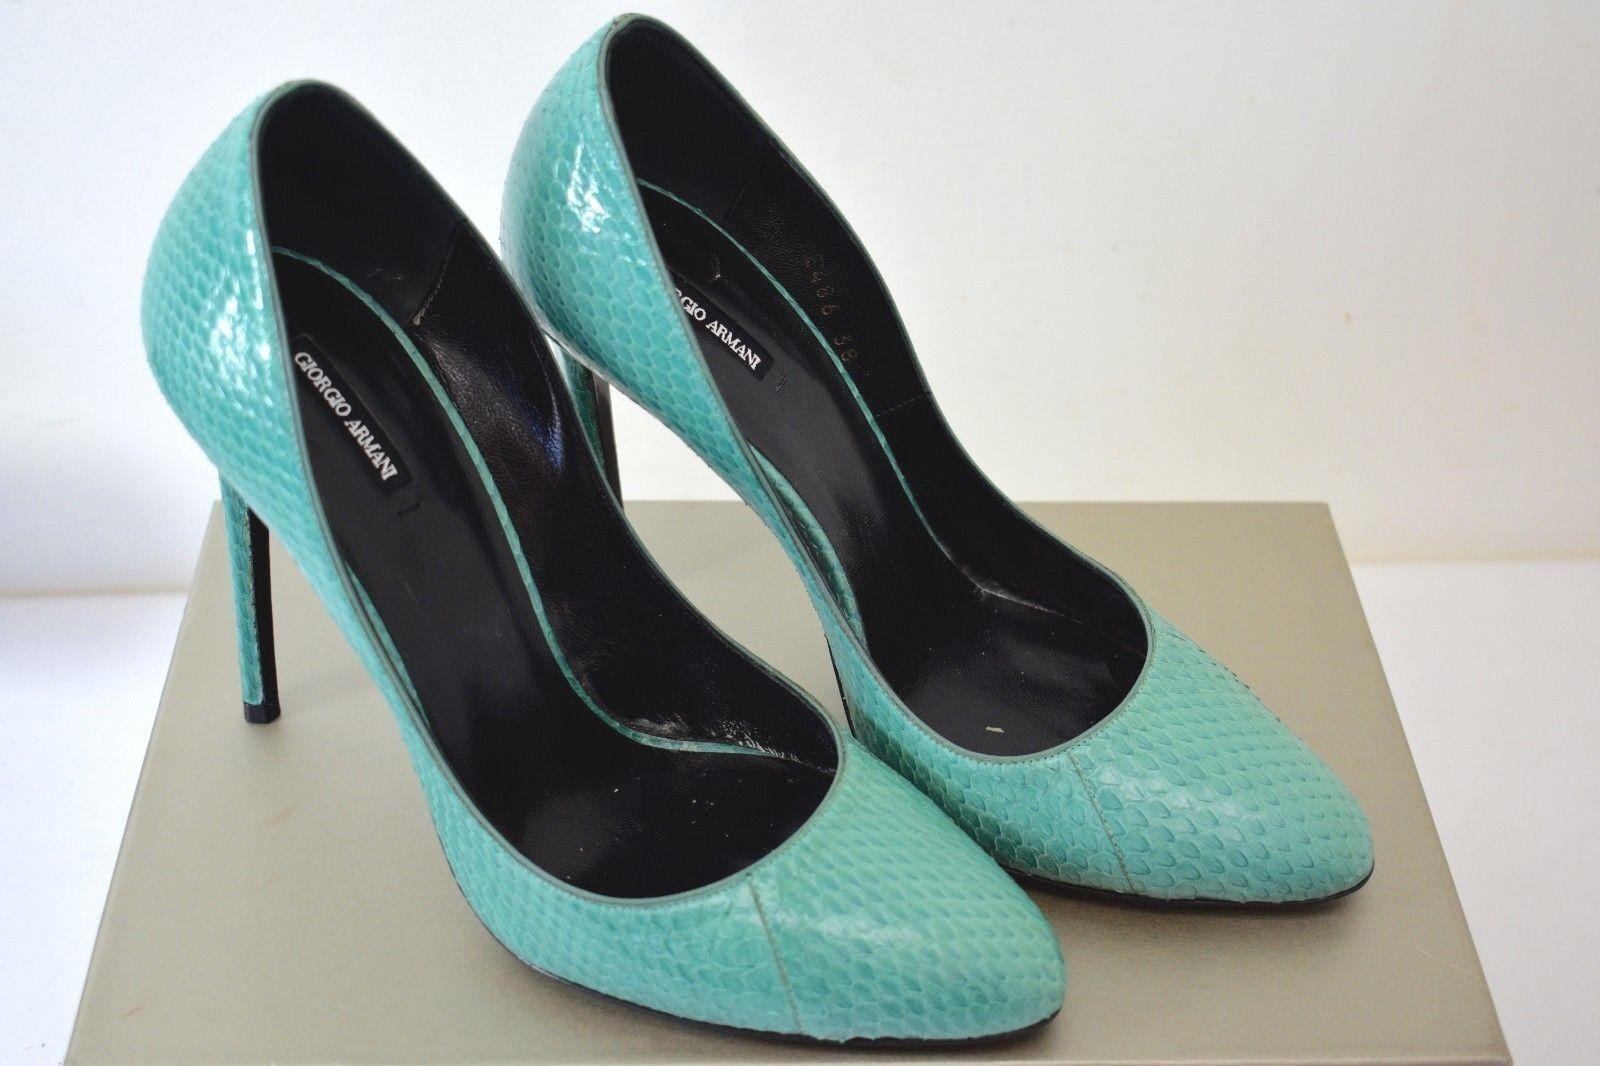 GIORGIO ARMANI Turquoise Couleur Genuine Python Leather Pump chaussures chaussures chaussures Taille 8B sy dfed5b